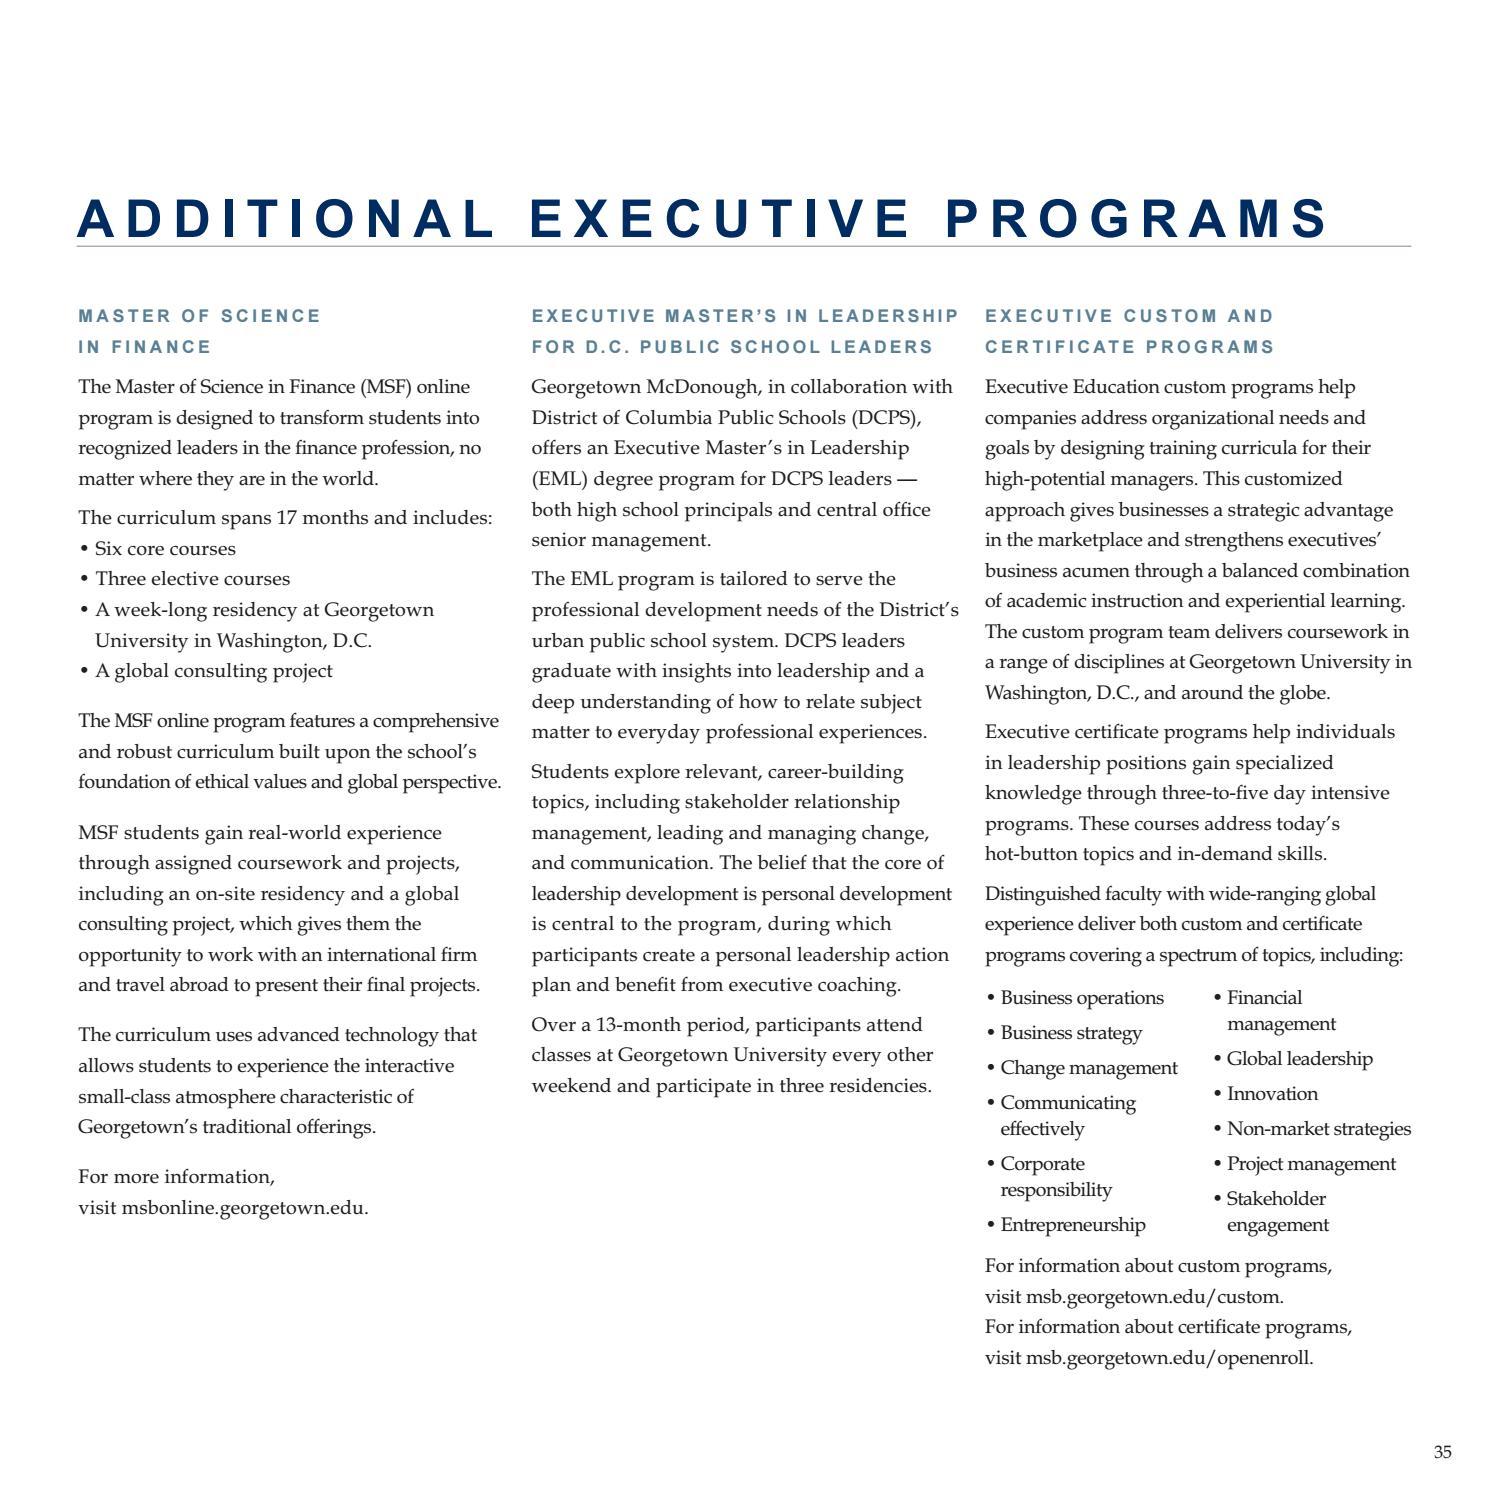 Georgetown McDonough Executive Degree Programs Brochure by